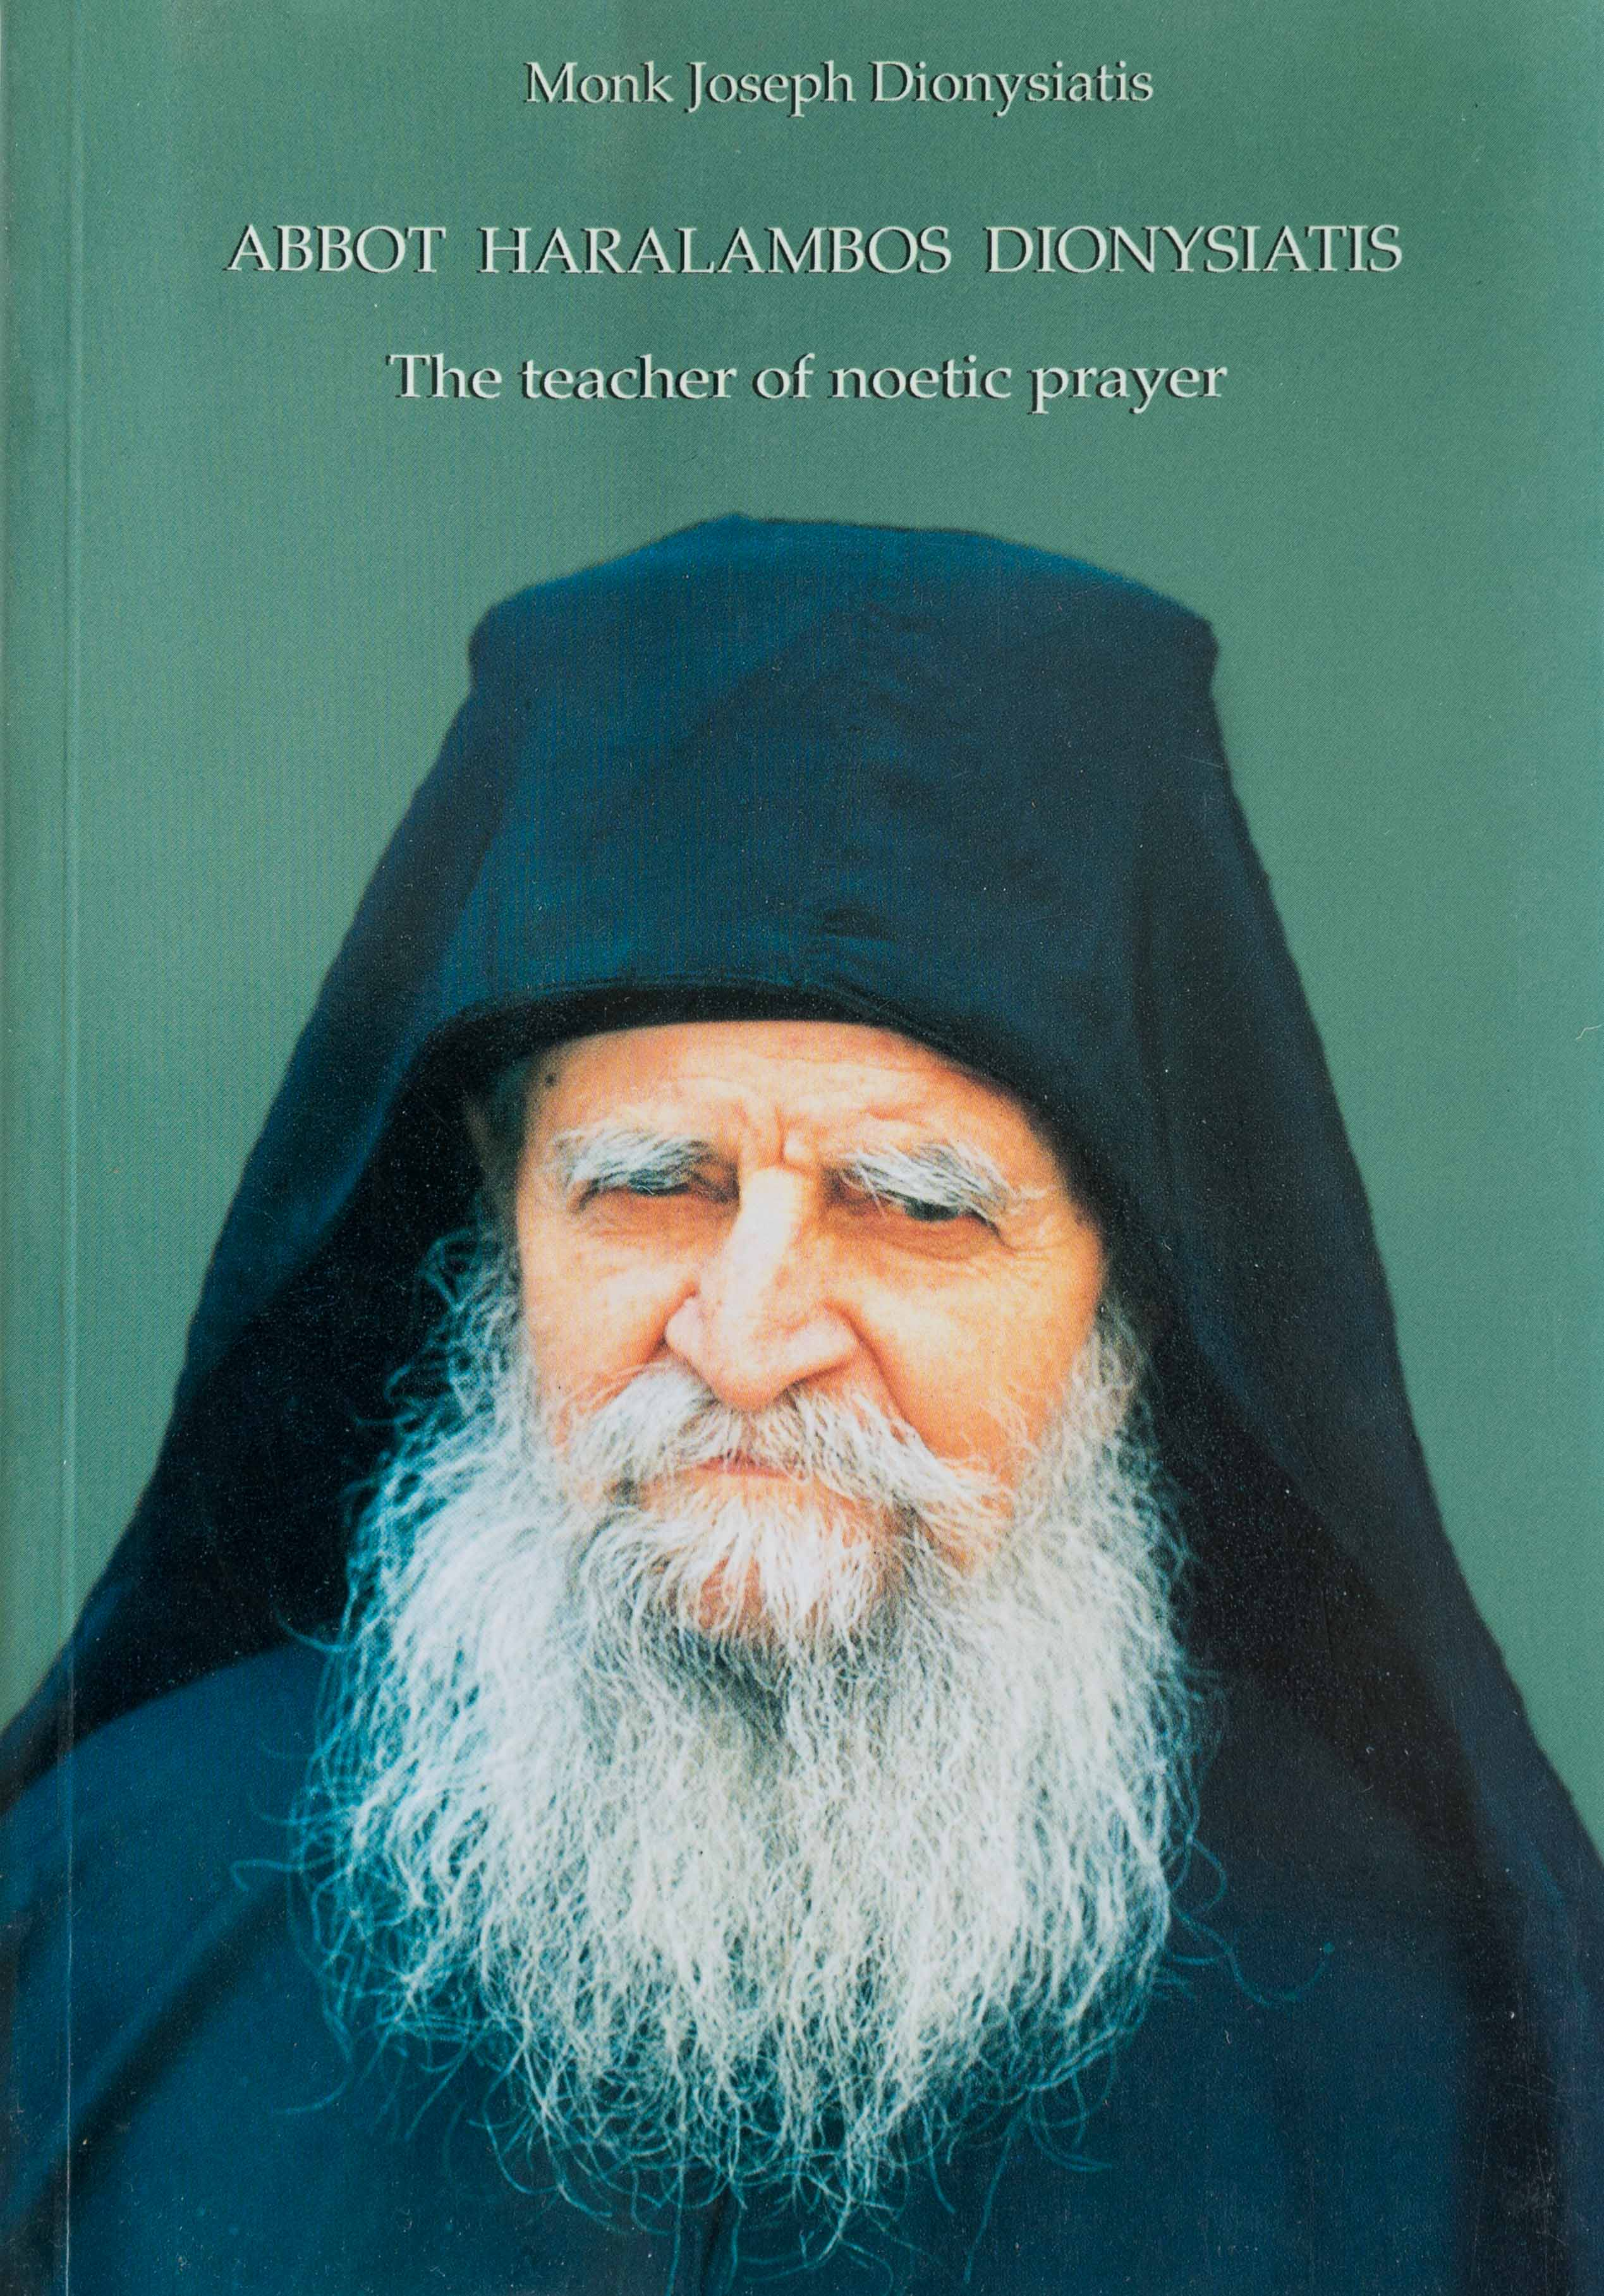 Abbot Haralambos Dionysiatis: The Teacher of Noetic Prayer